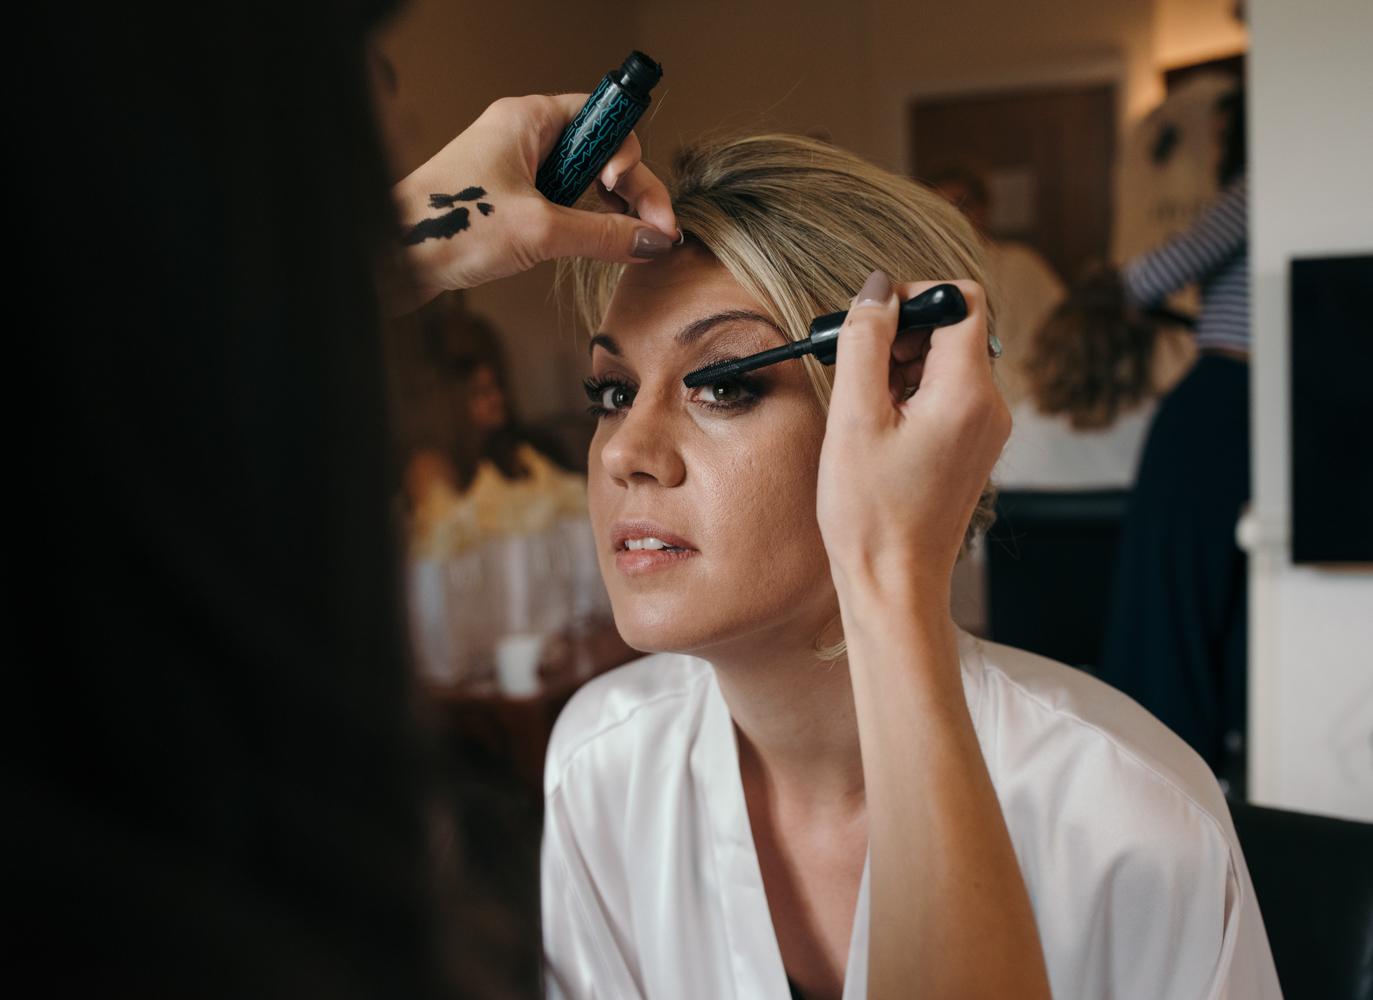 The bride having her eye makeup applied.